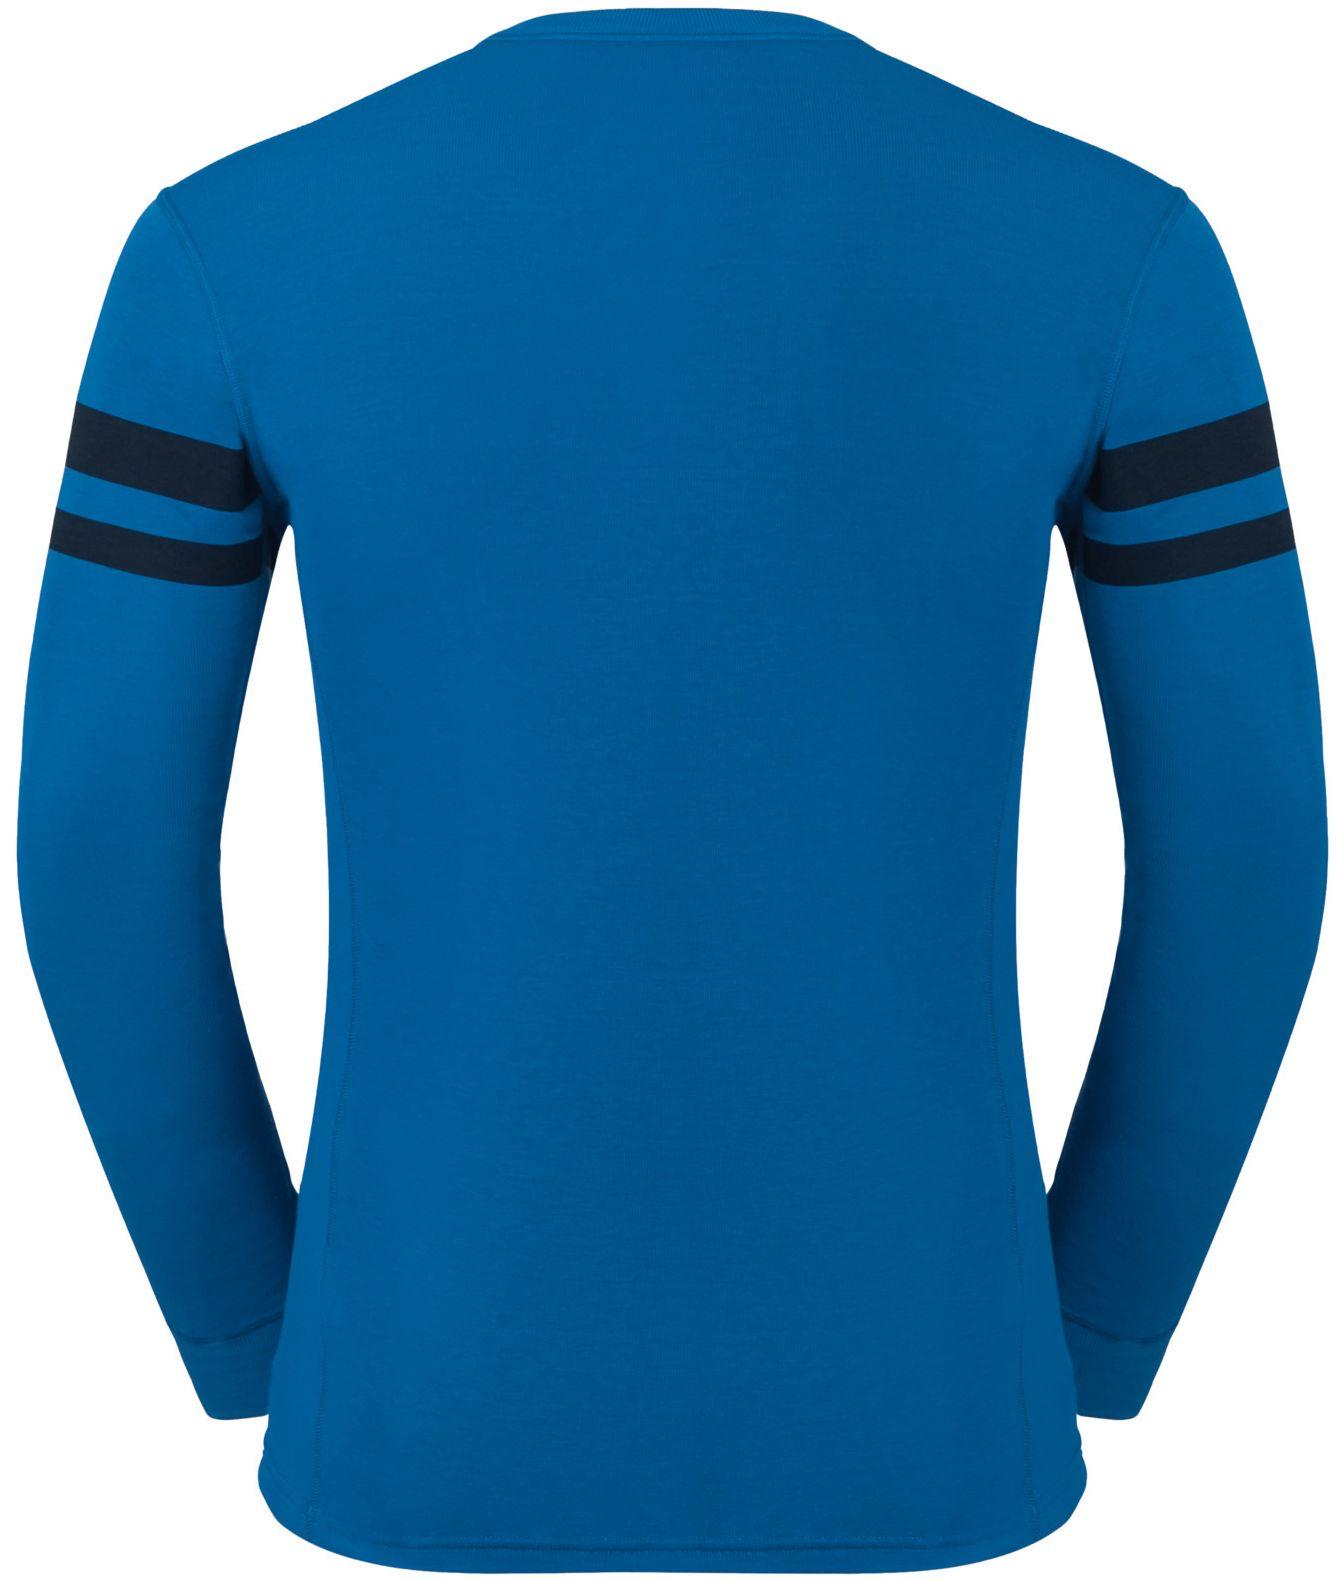 45a1c8bfd1 Odlo JUL PRINT SHIRT L S CREW NECK. Pánské funkční tričko. Pánské funkční  tričko